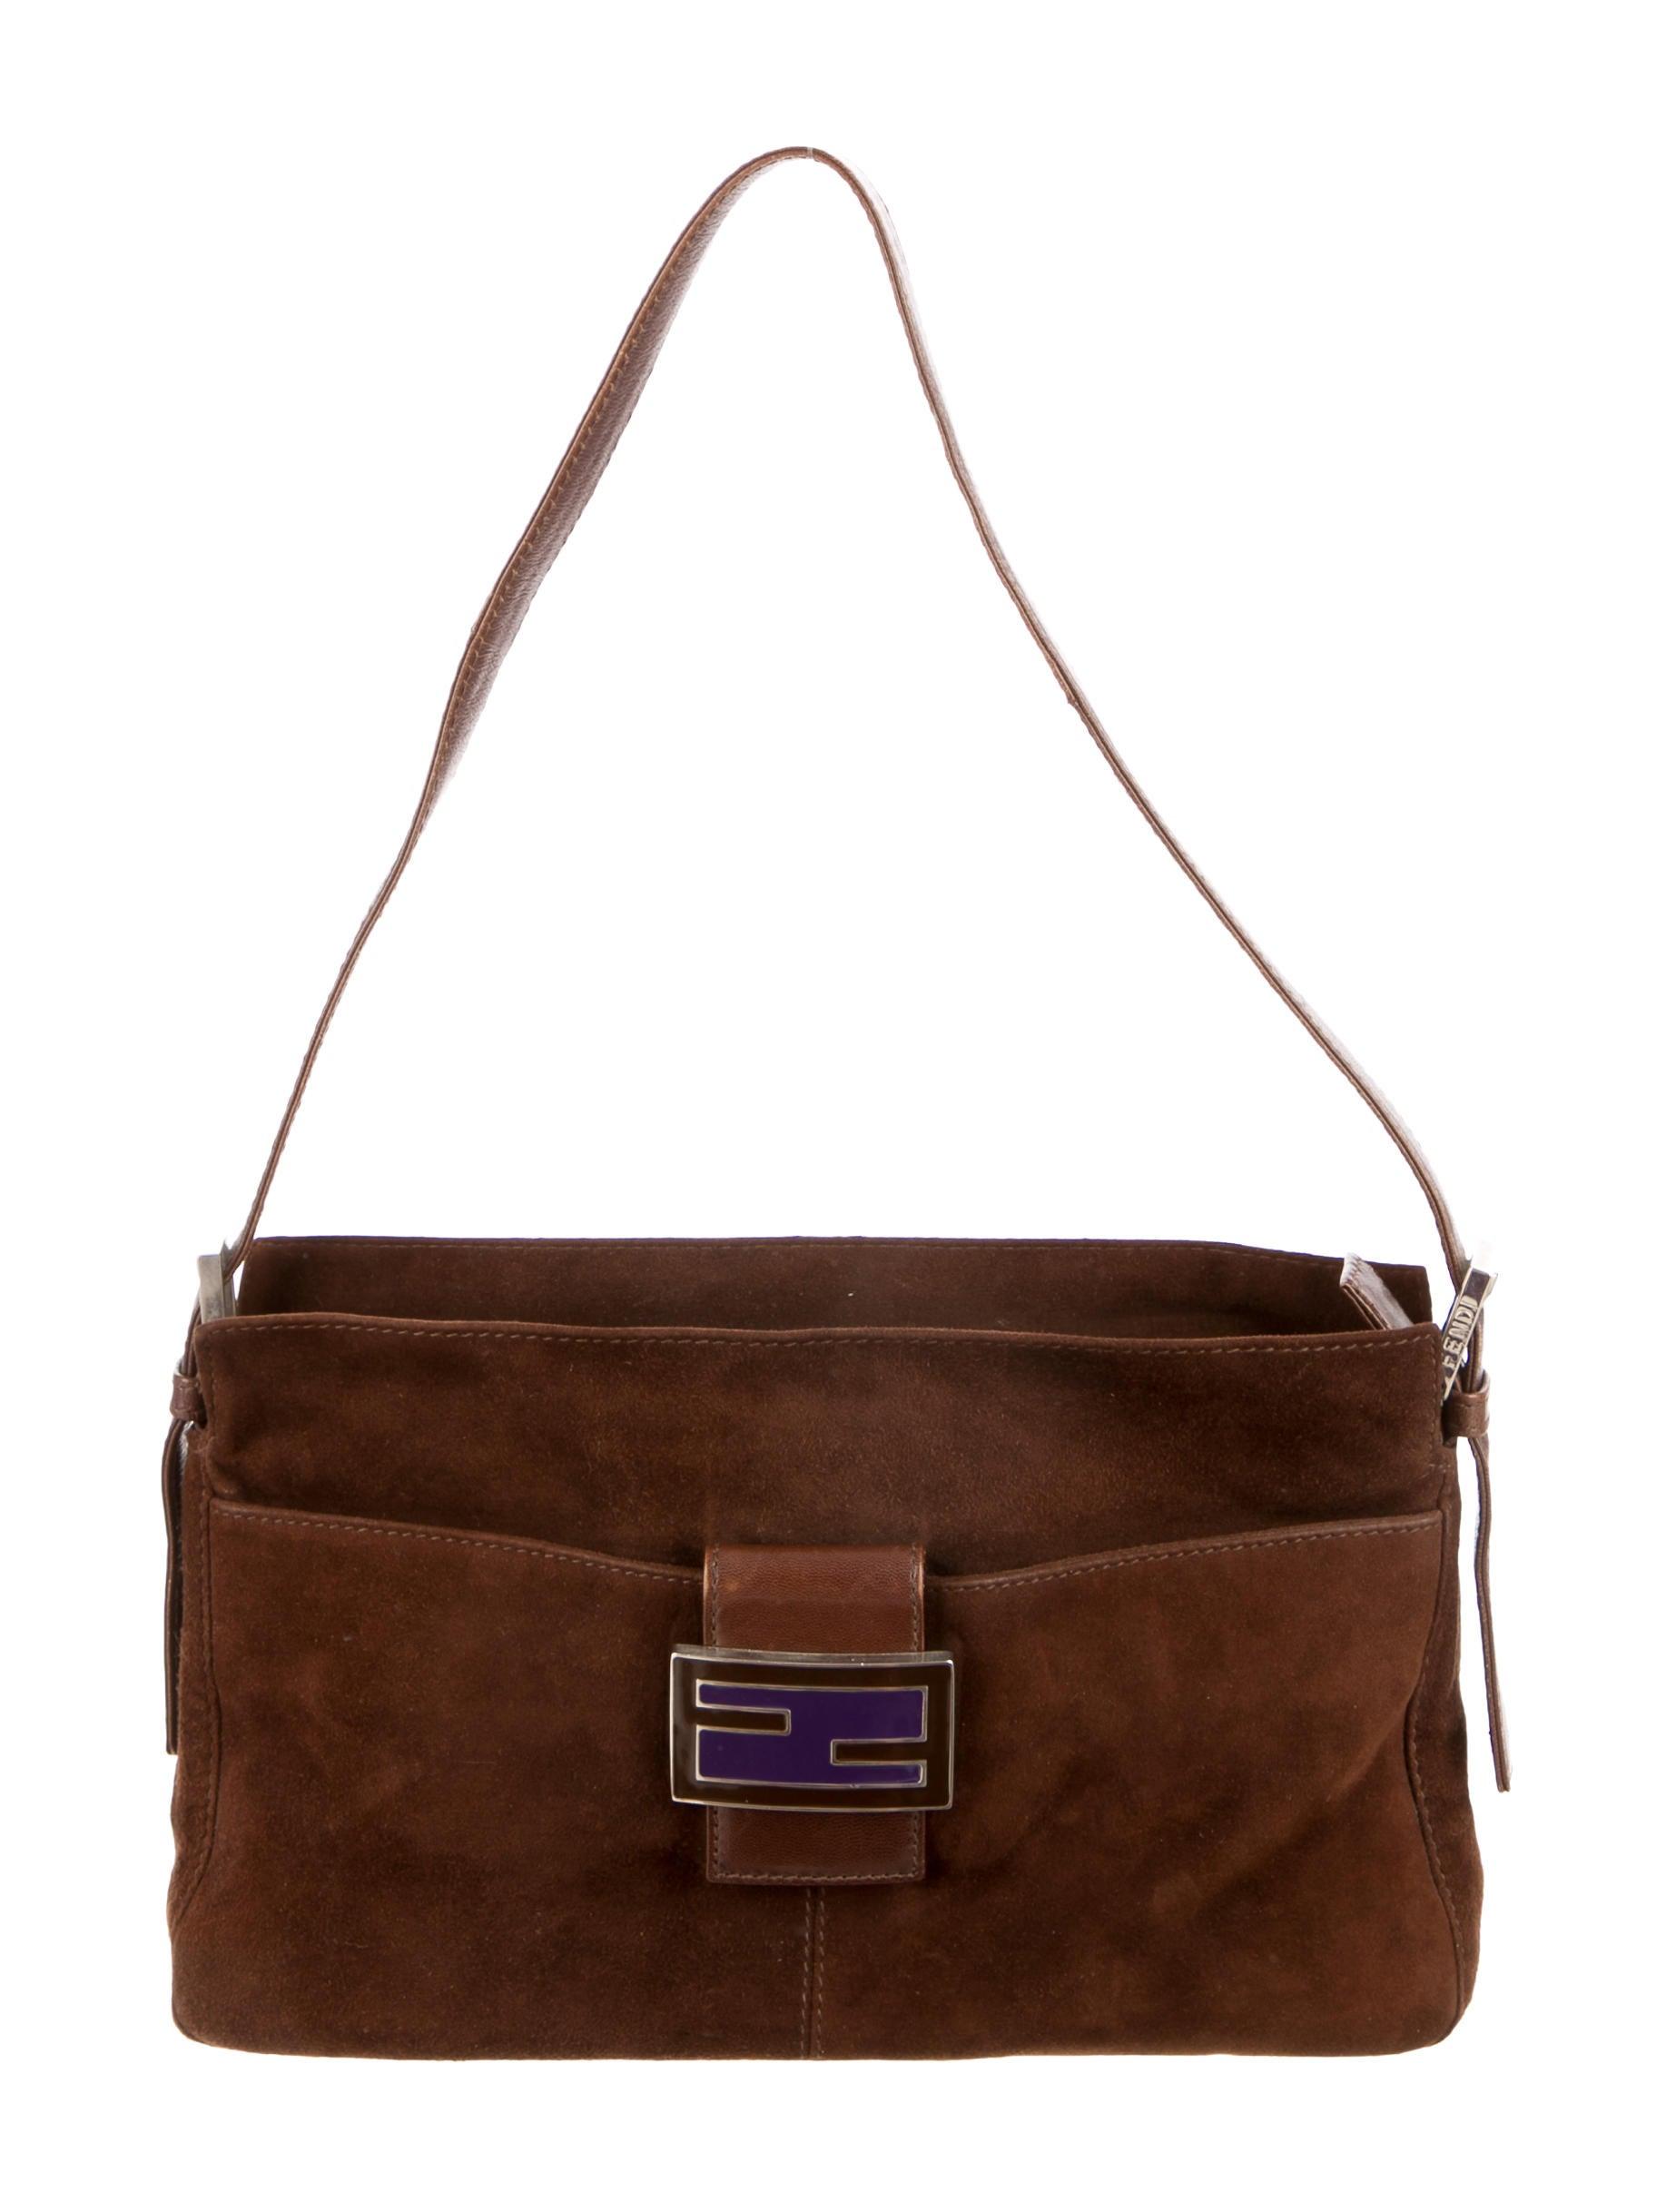 Designer replica chloe 90300 ladies messenger bag handbag for Design replica